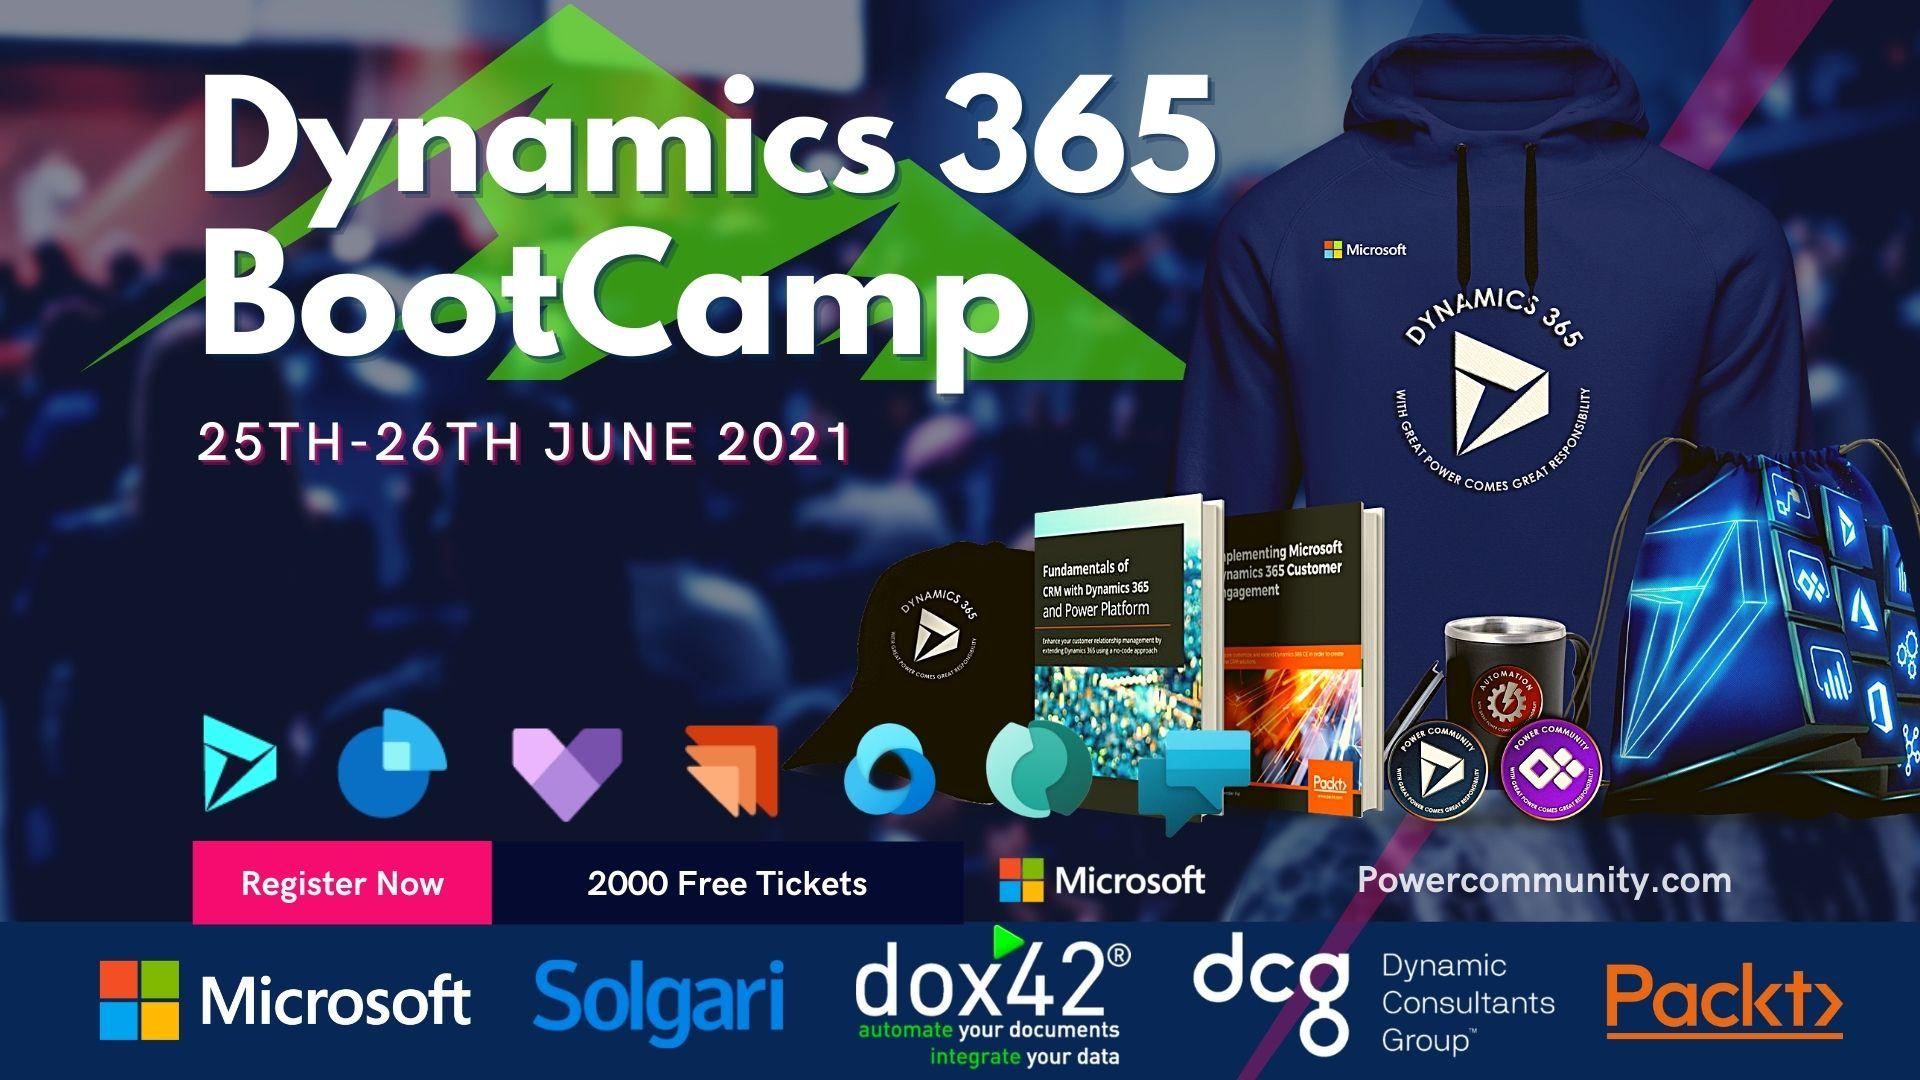 Microsoft Dynamics 365 Bootcamp 2021